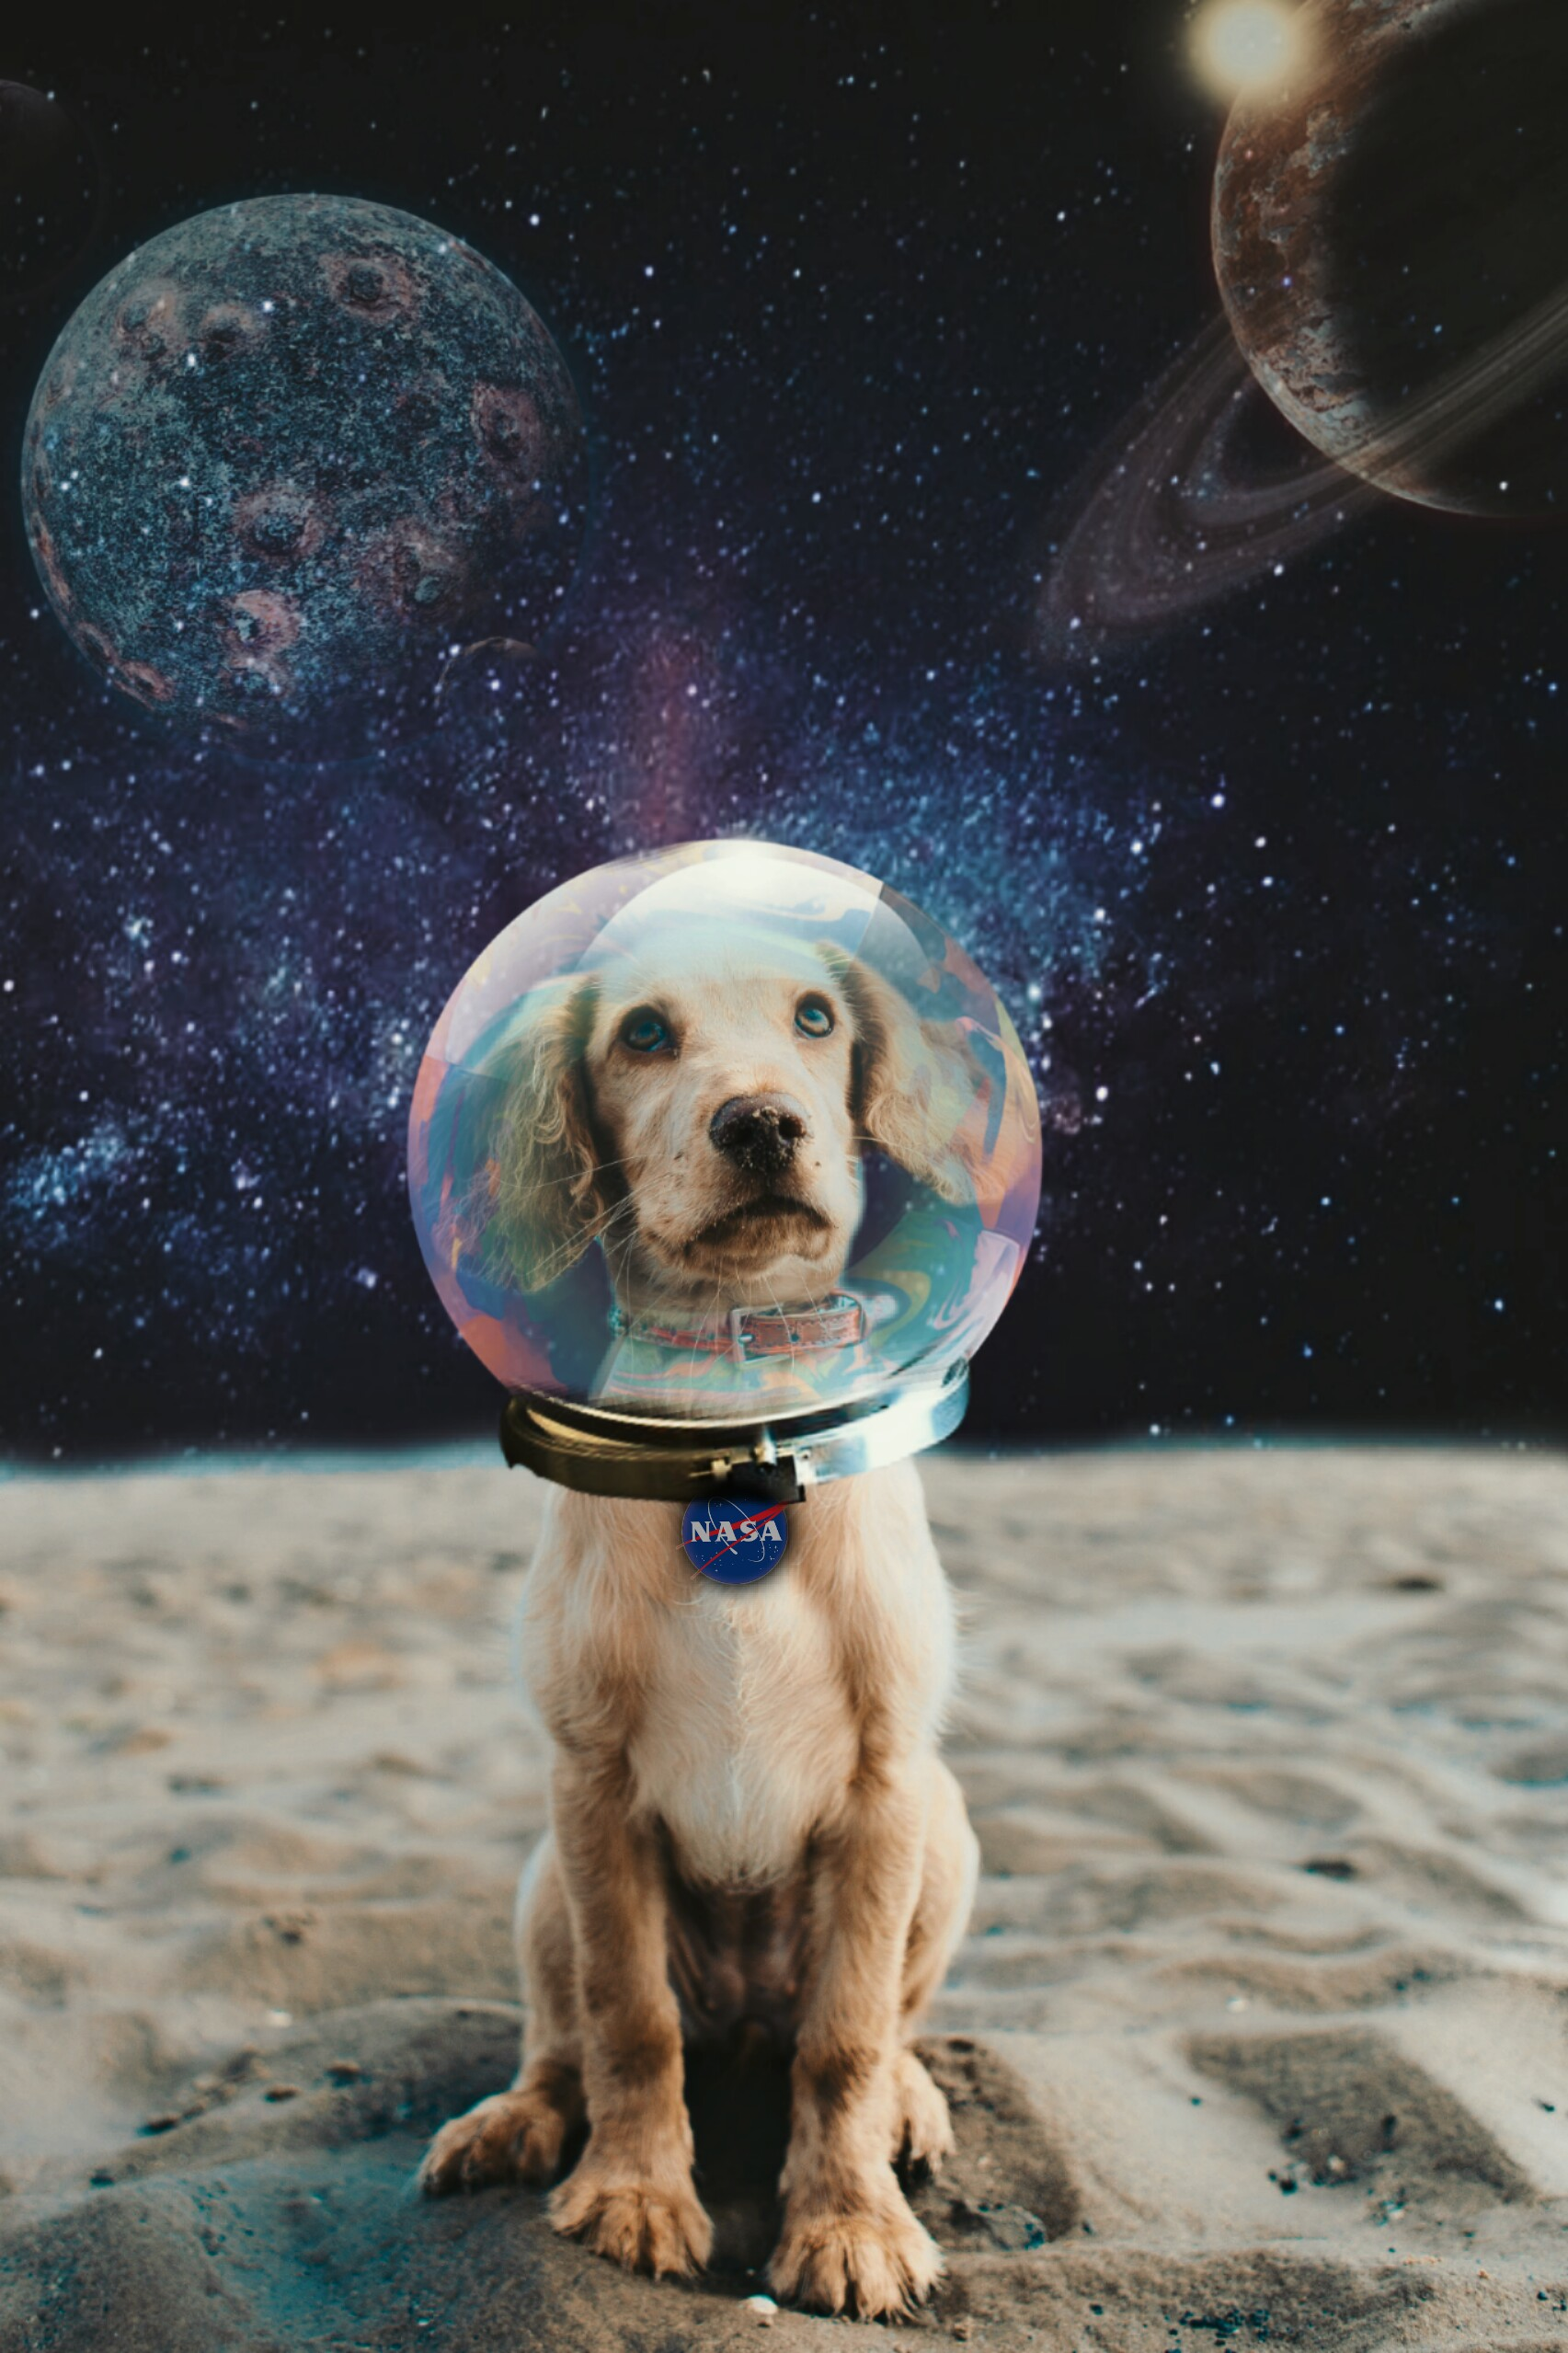 #freetoedit Space 🐕 #edit #picsart #puppy #dog #space #astronaut #magic